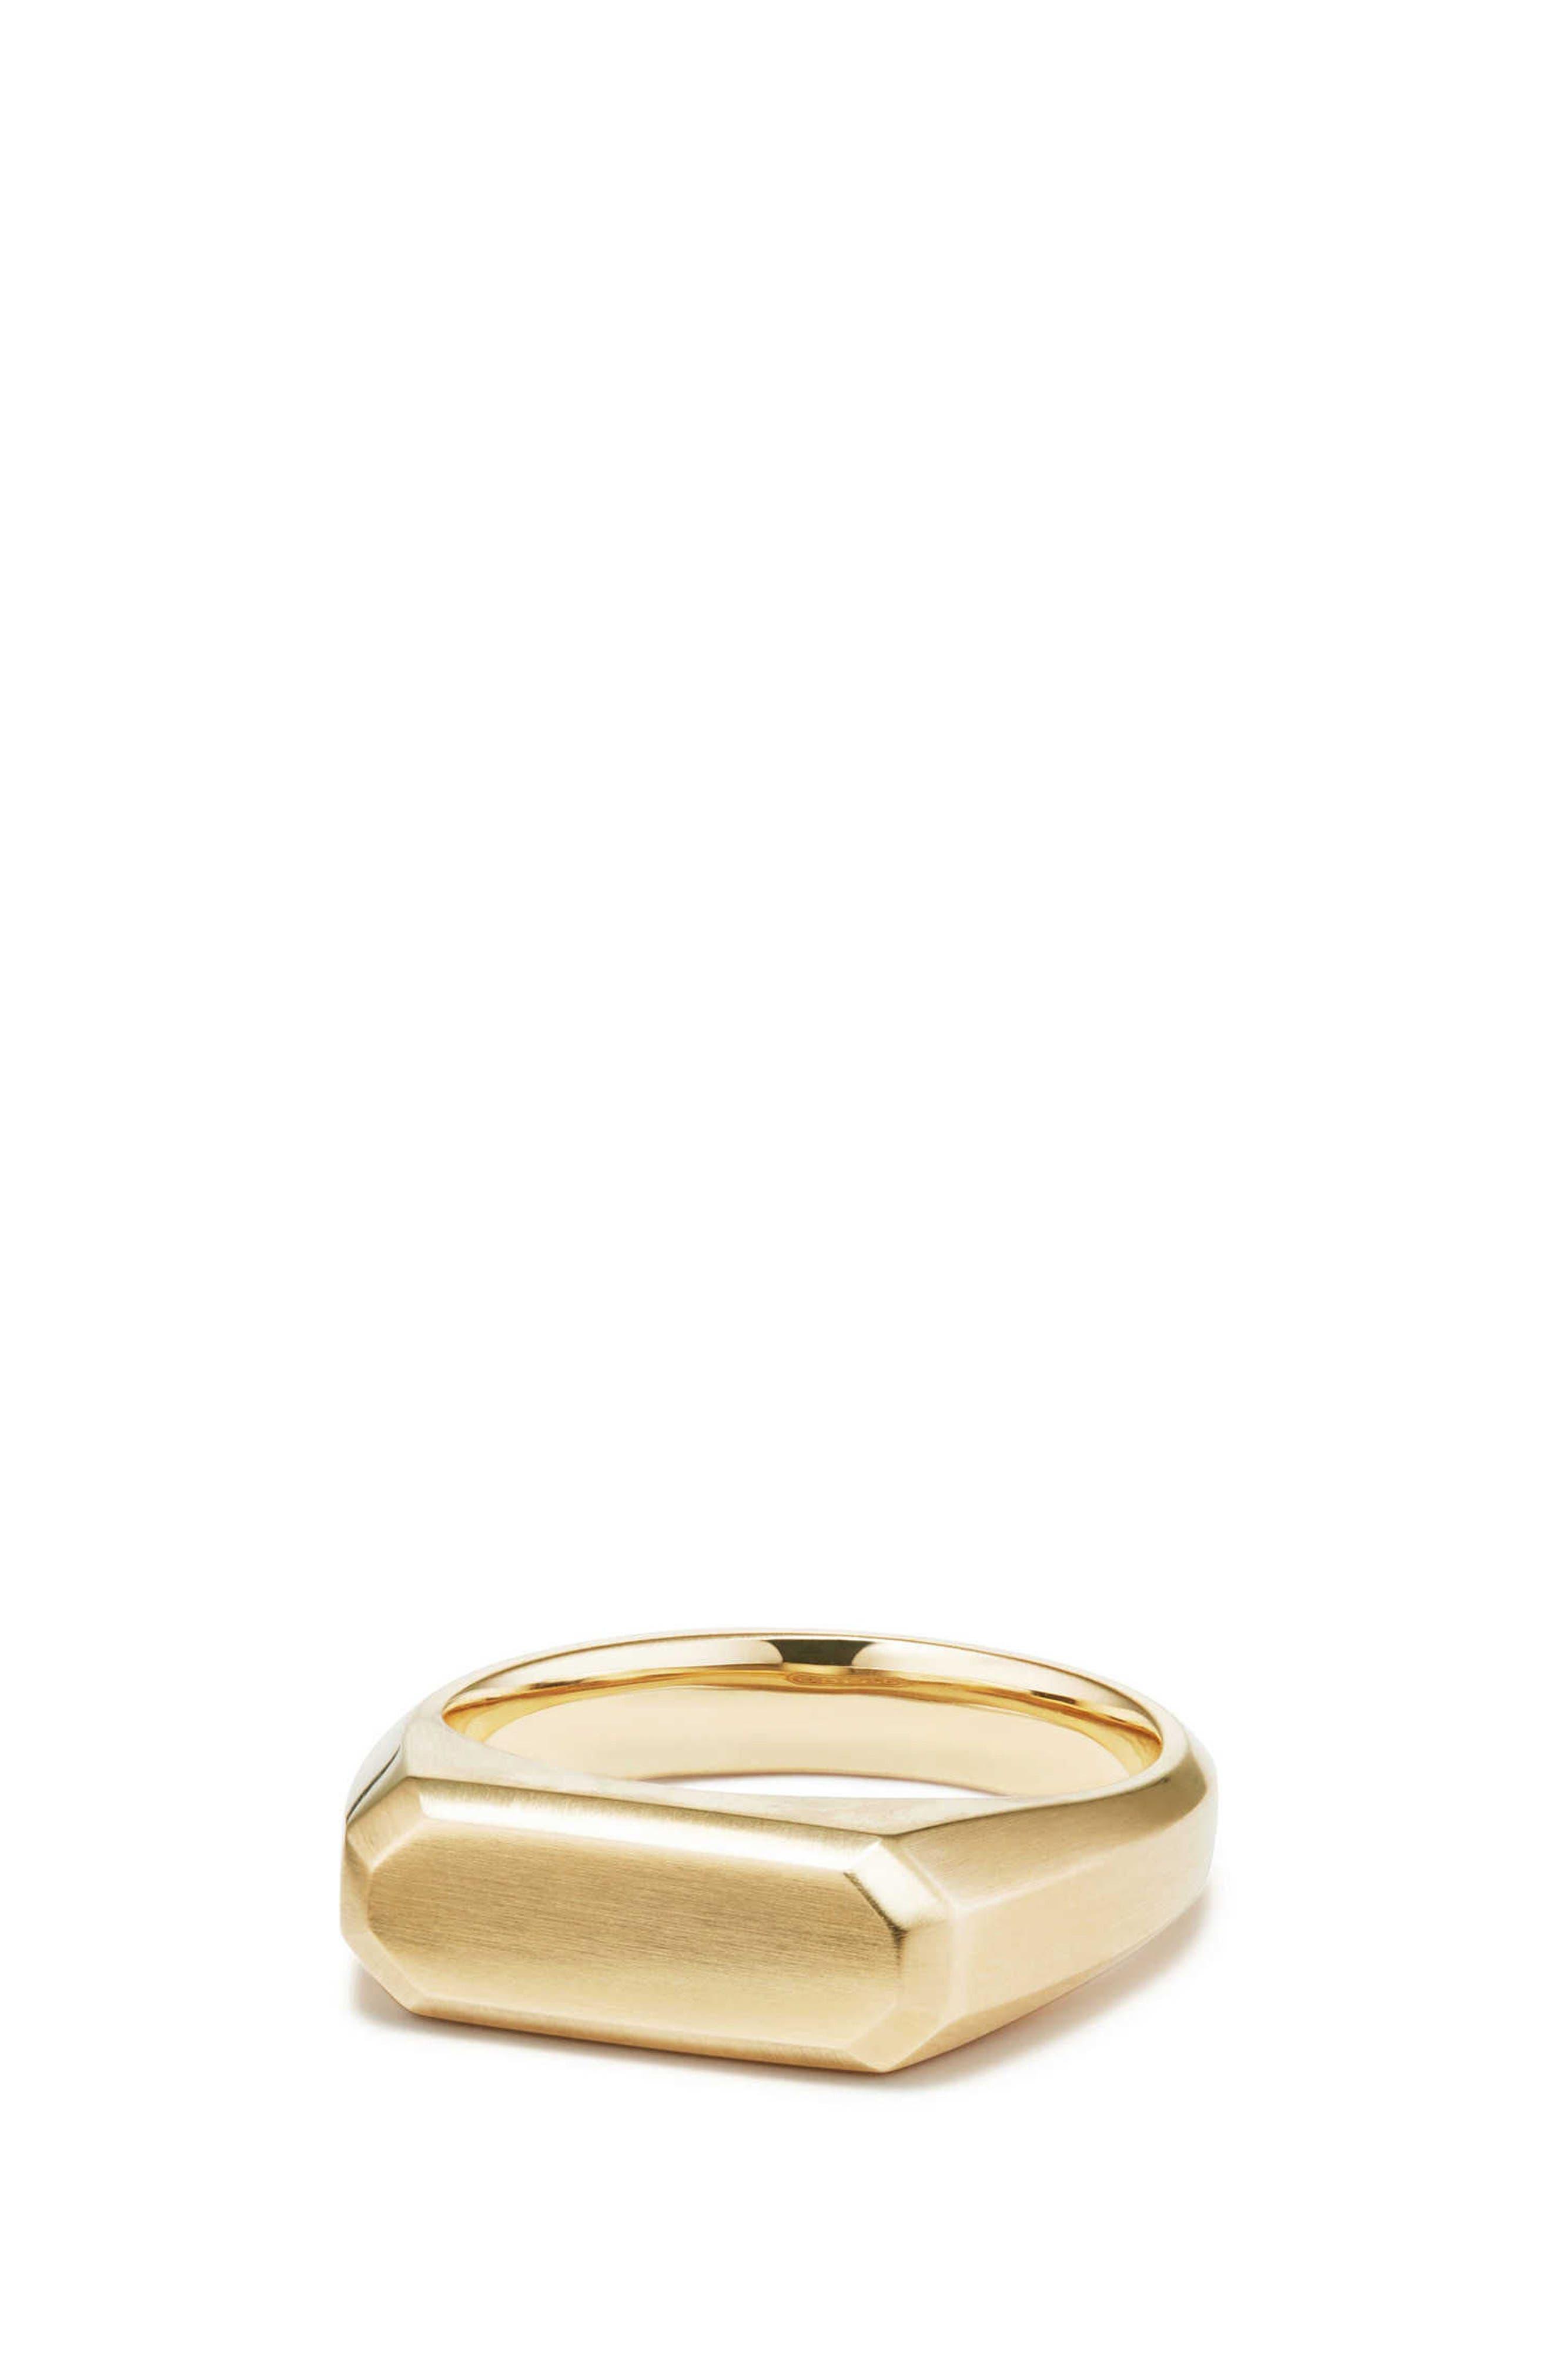 Streamline Signet Ring in 18K Gold,                         Main,                         color, Gold